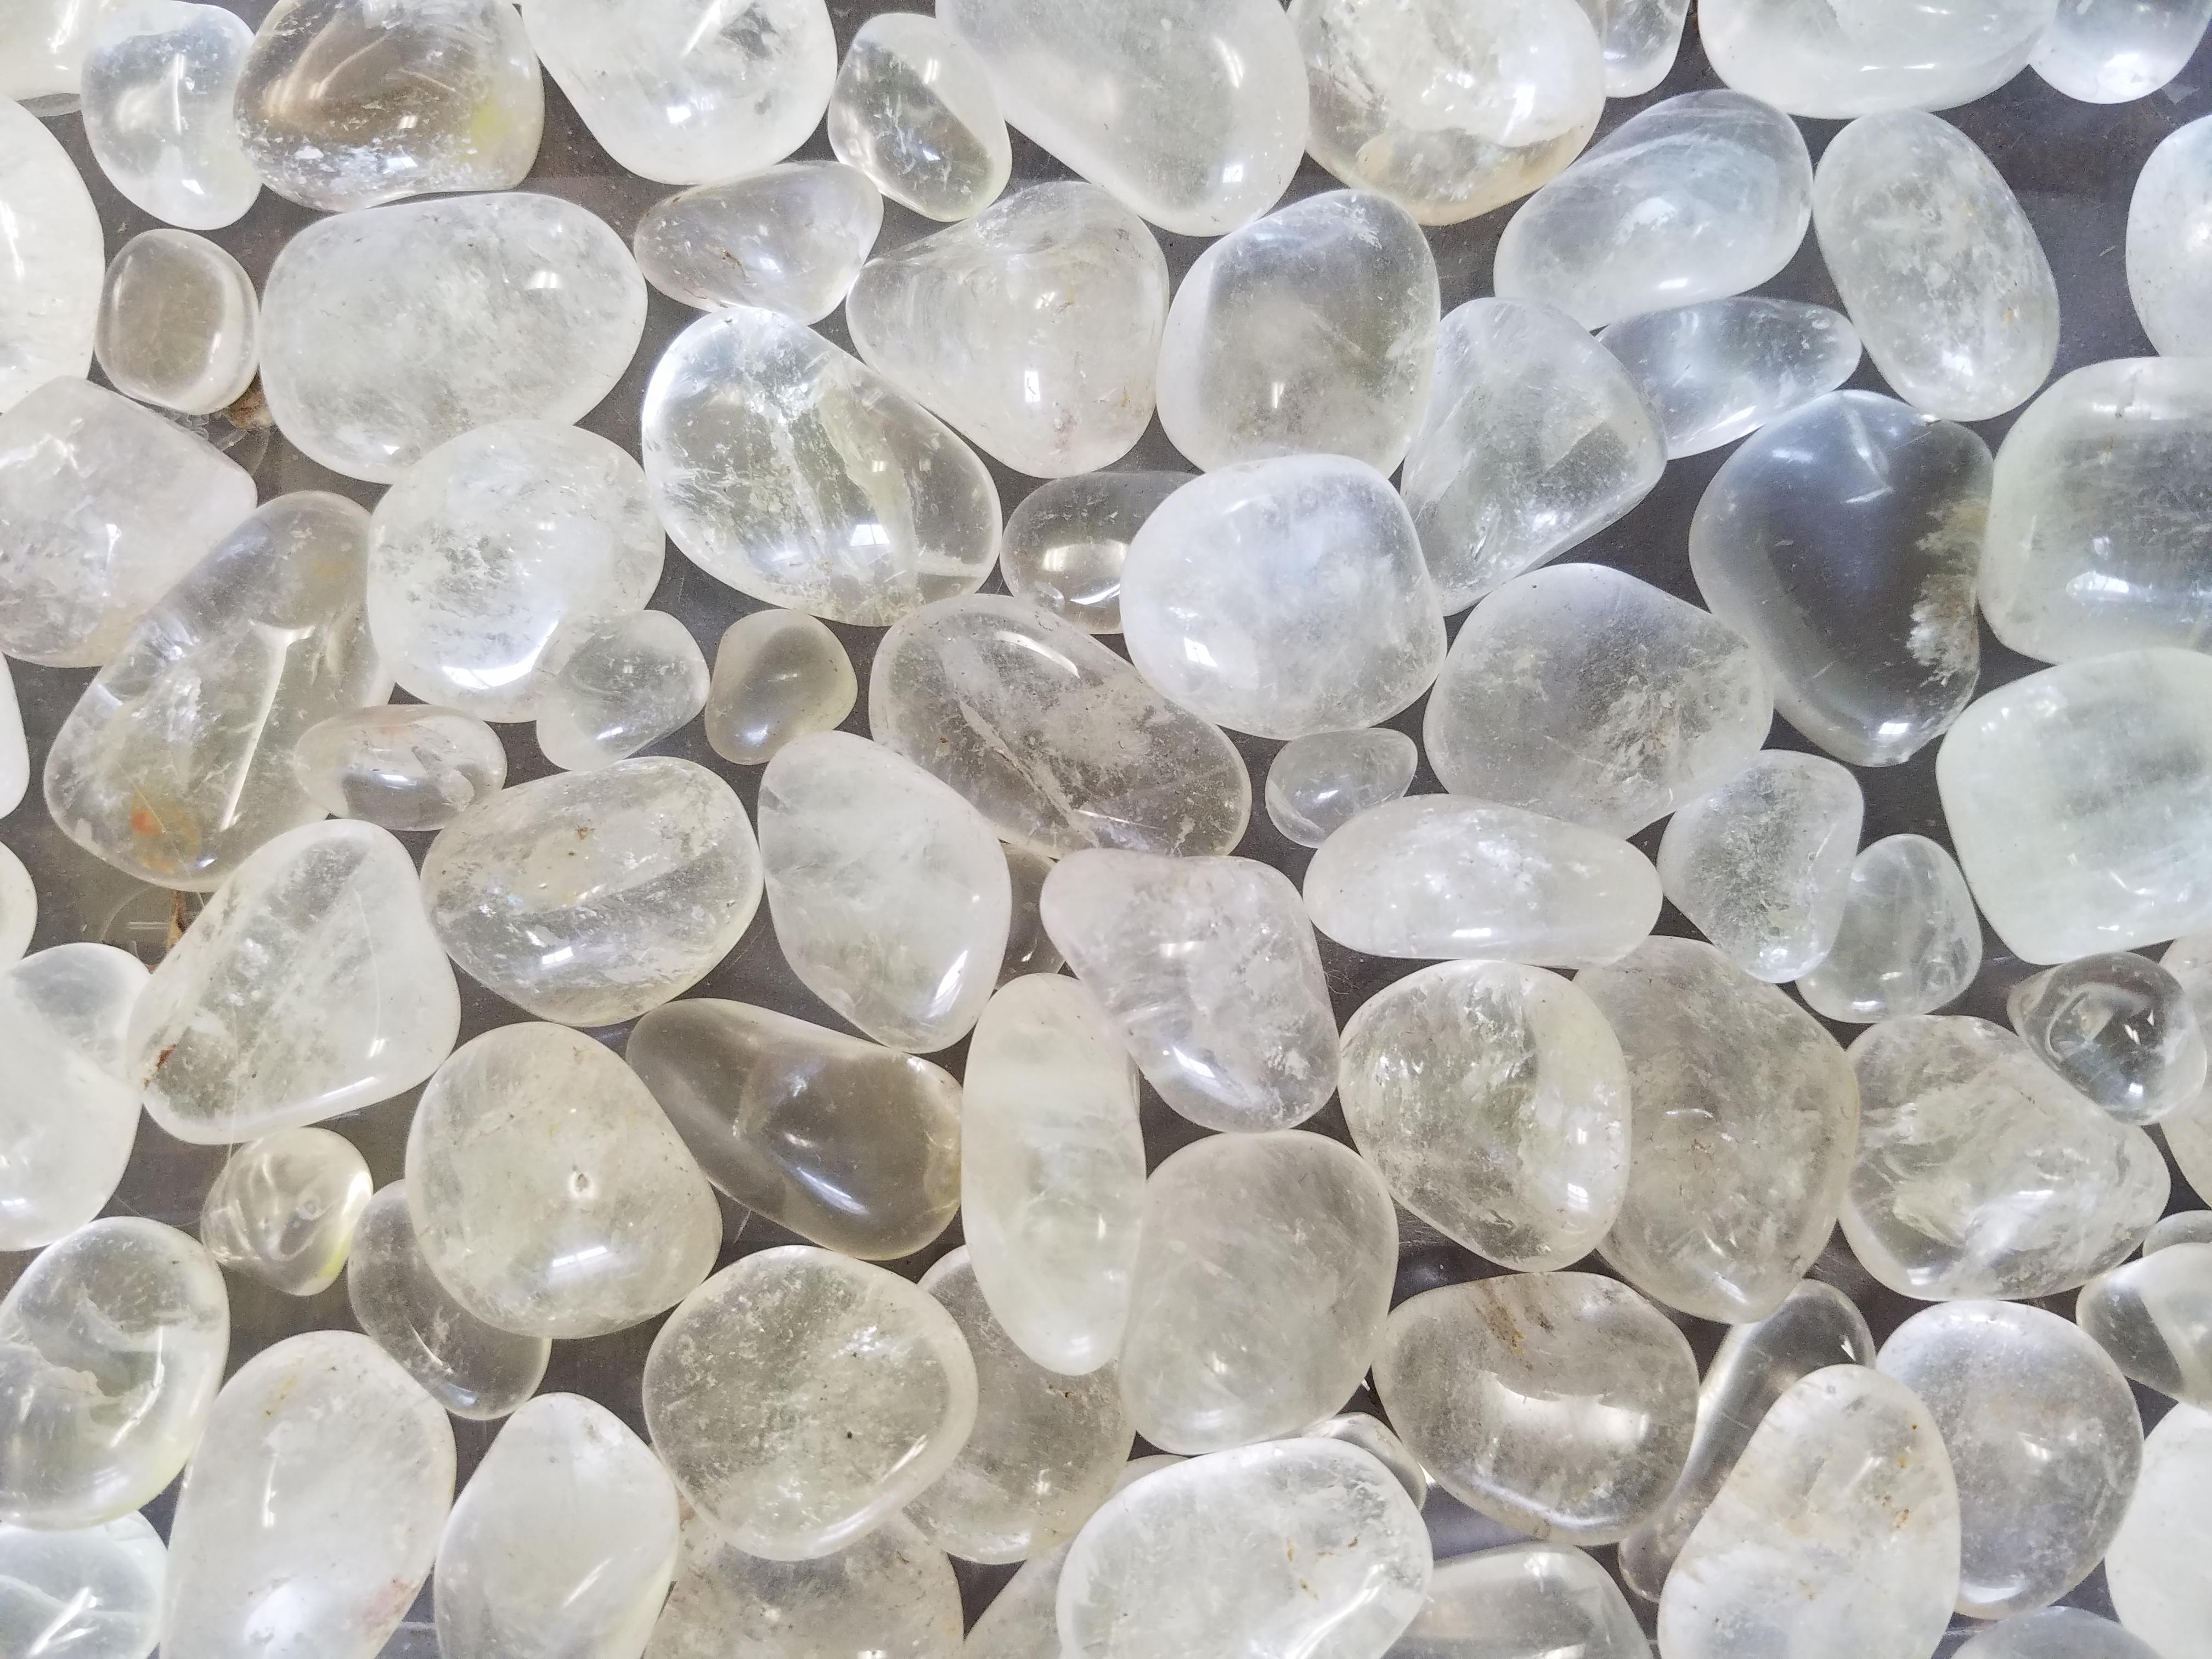 clear-white-stones-1668.jpg